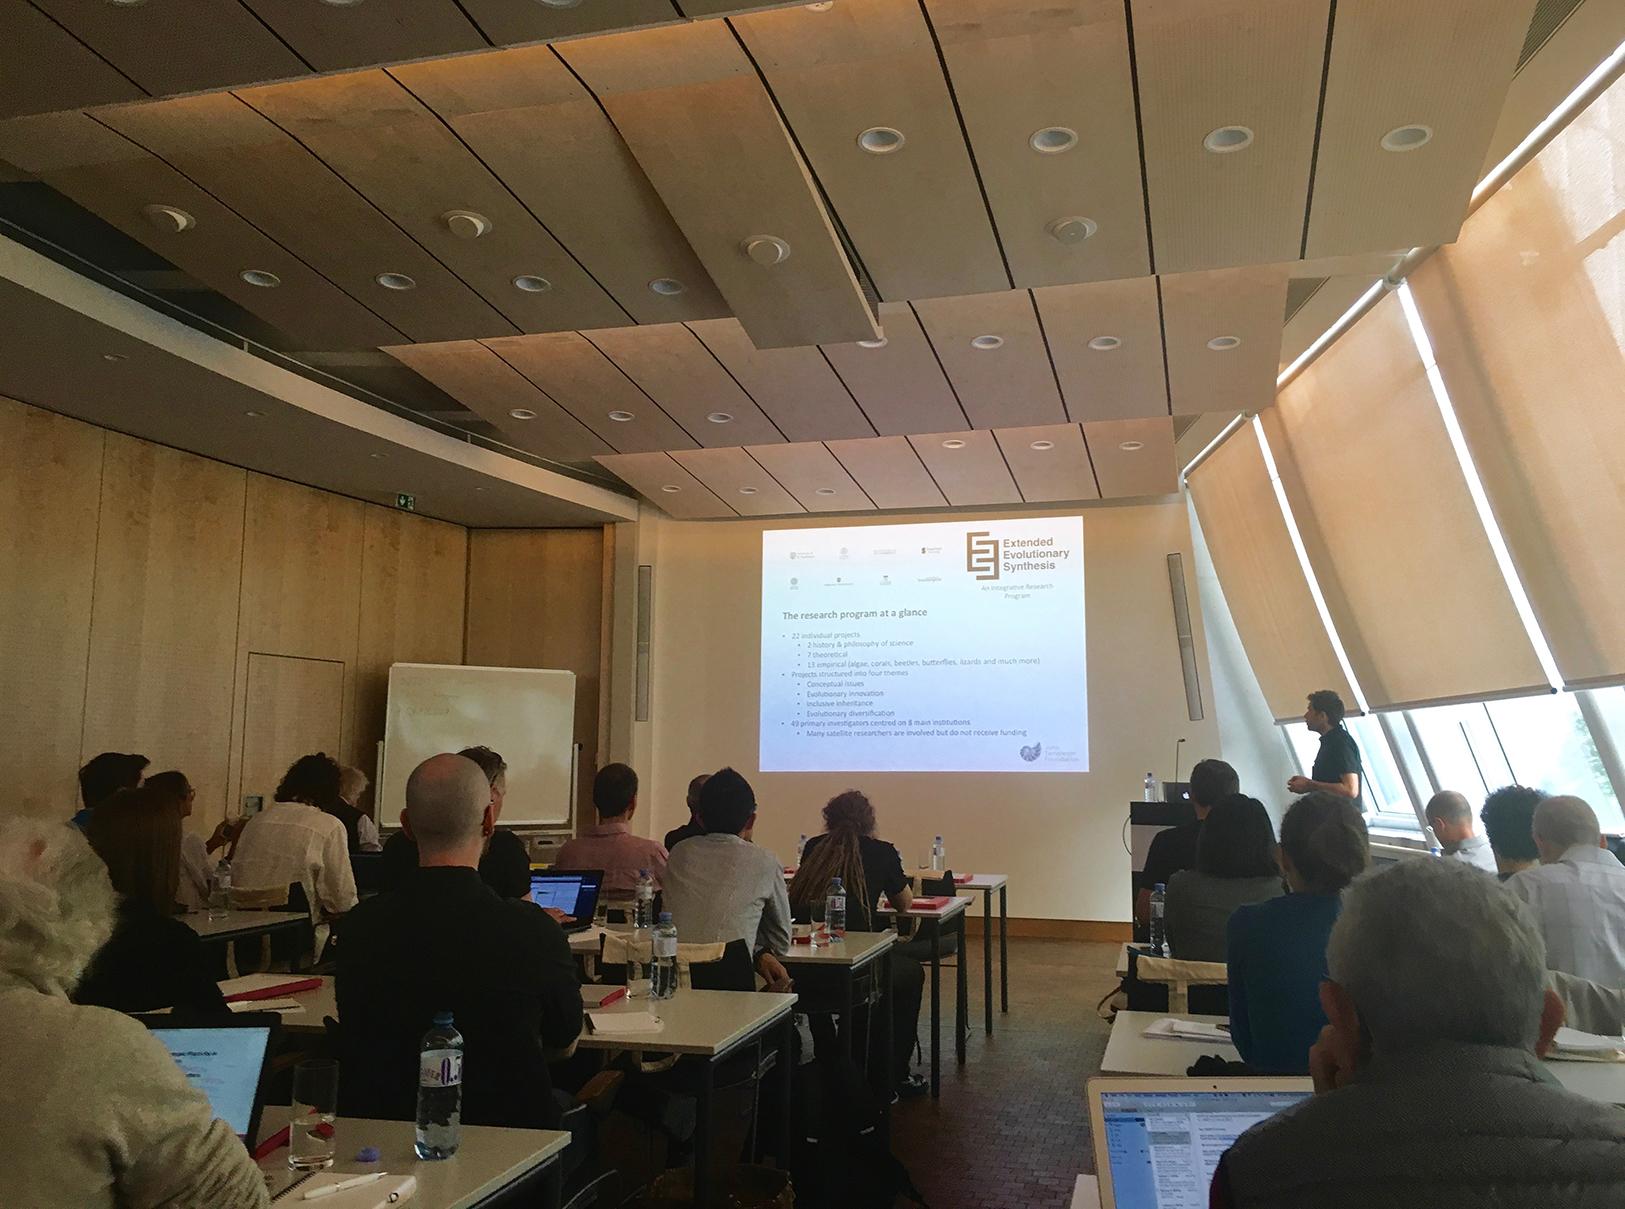 Tobias Uller's presentation